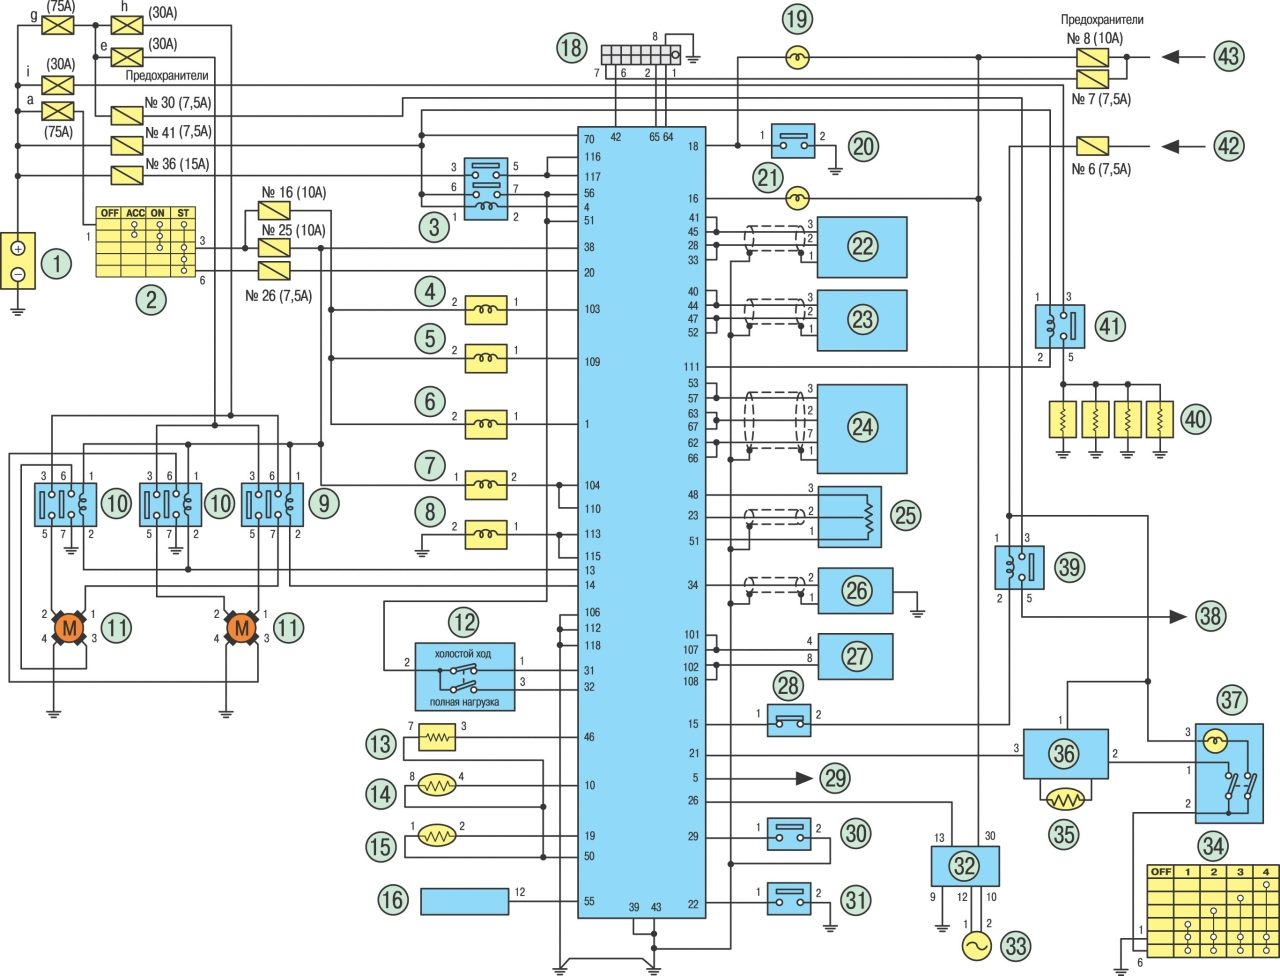 almera n15 схема кондиционер